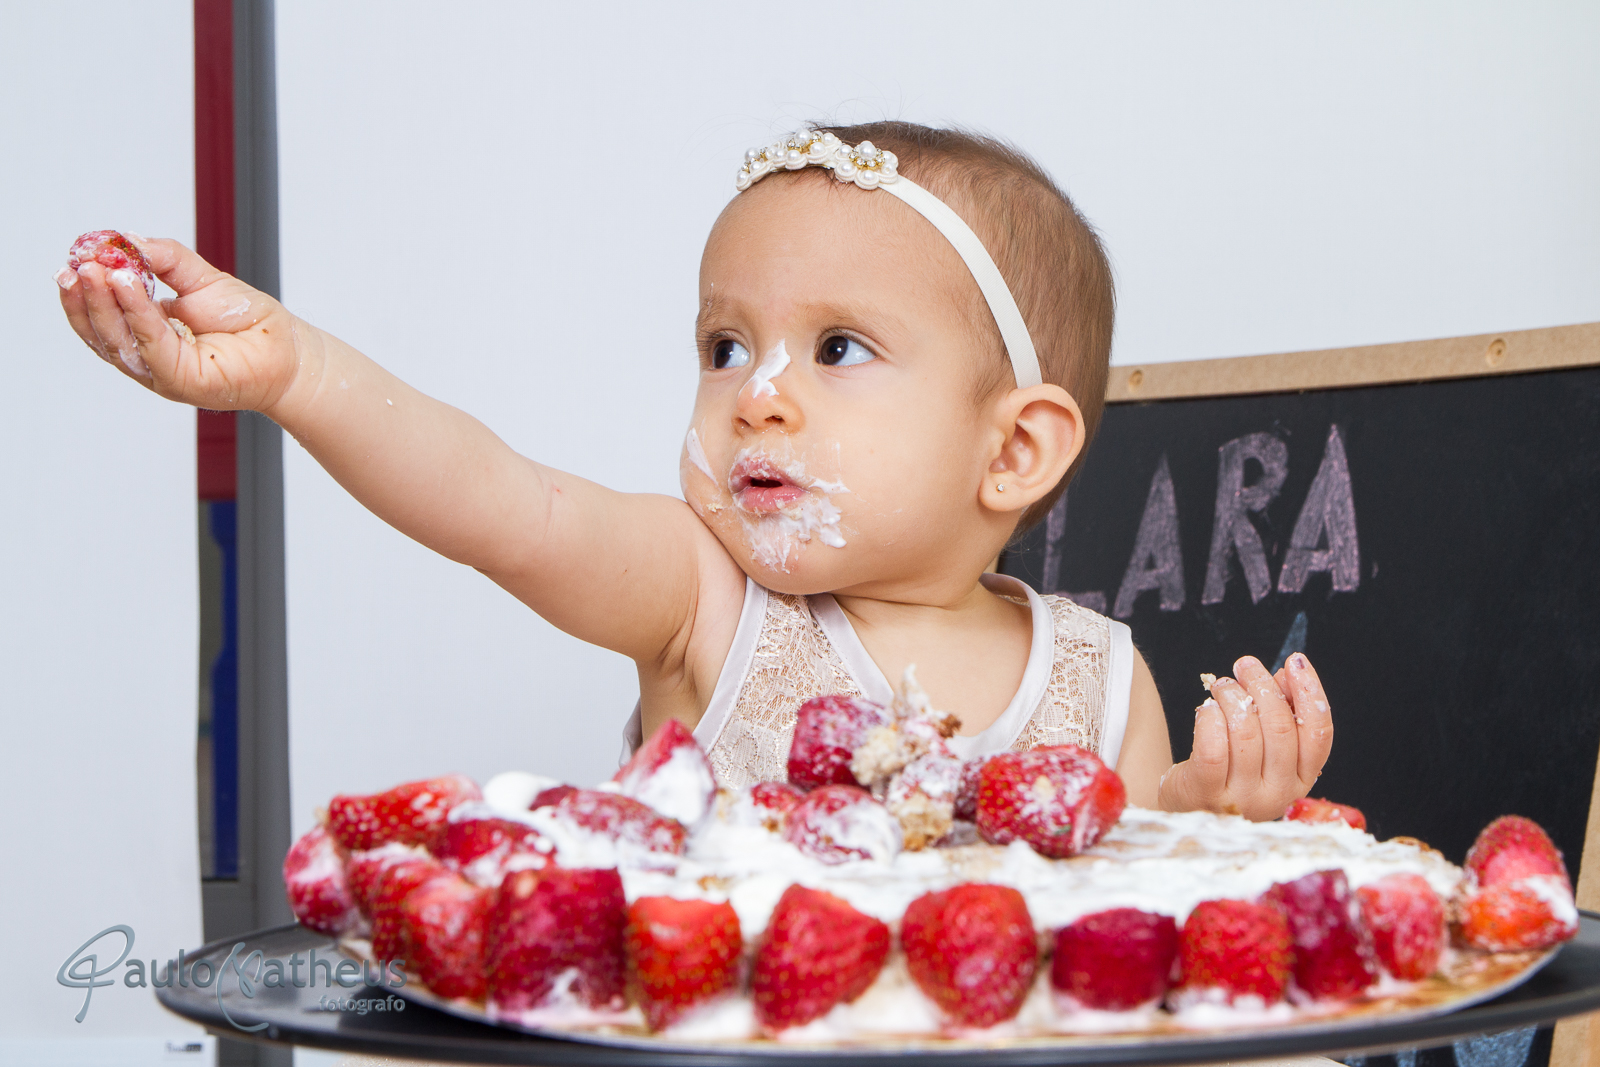 ensaio fotográfico Infantil estilo Smash the Cake